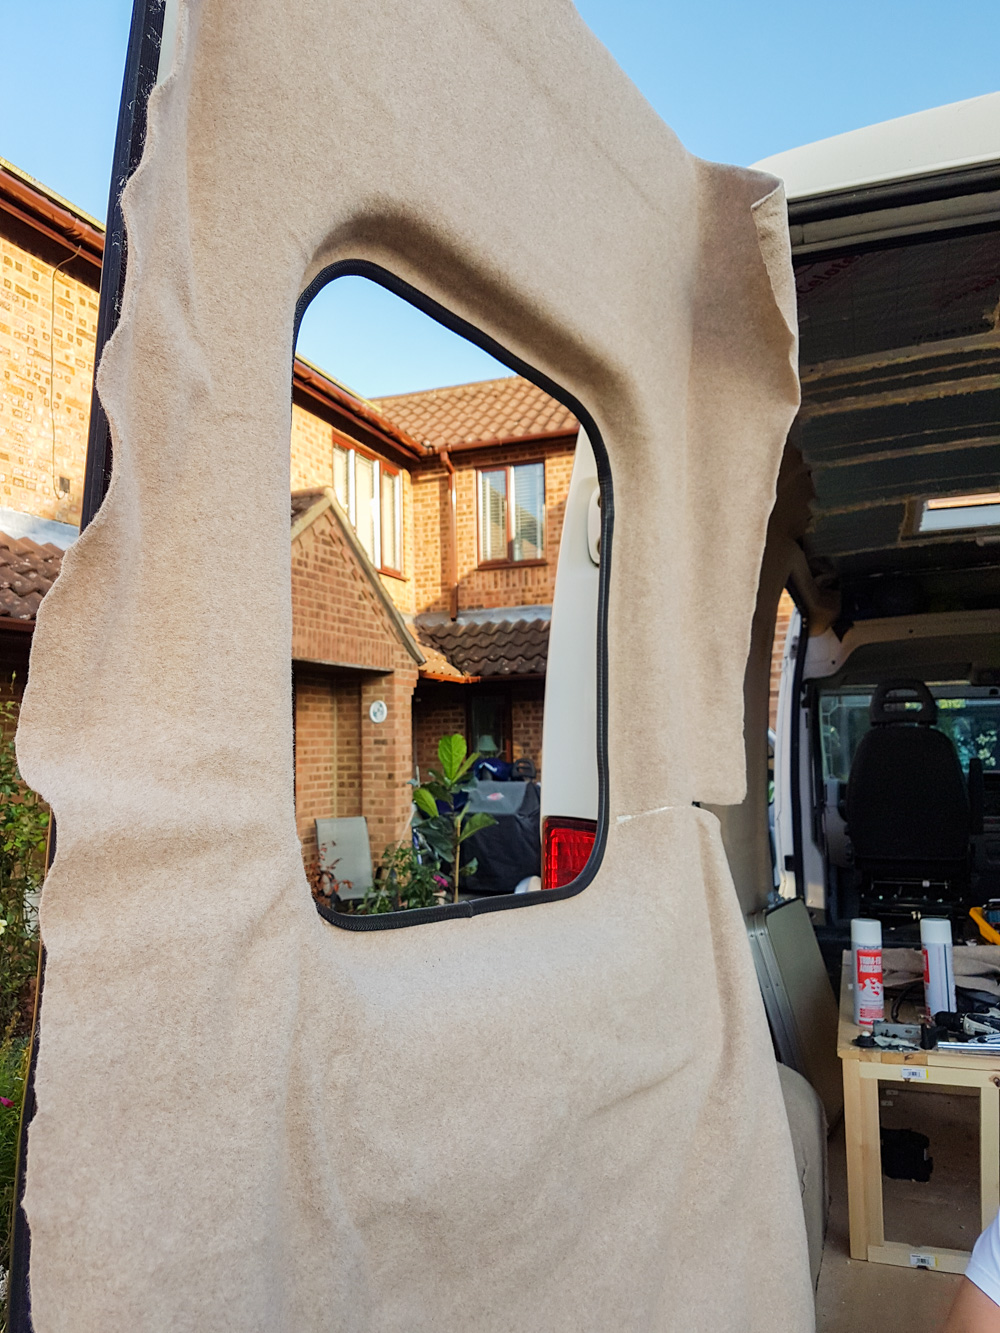 Van Conversion Carpet Lining The Van Walls Adventures